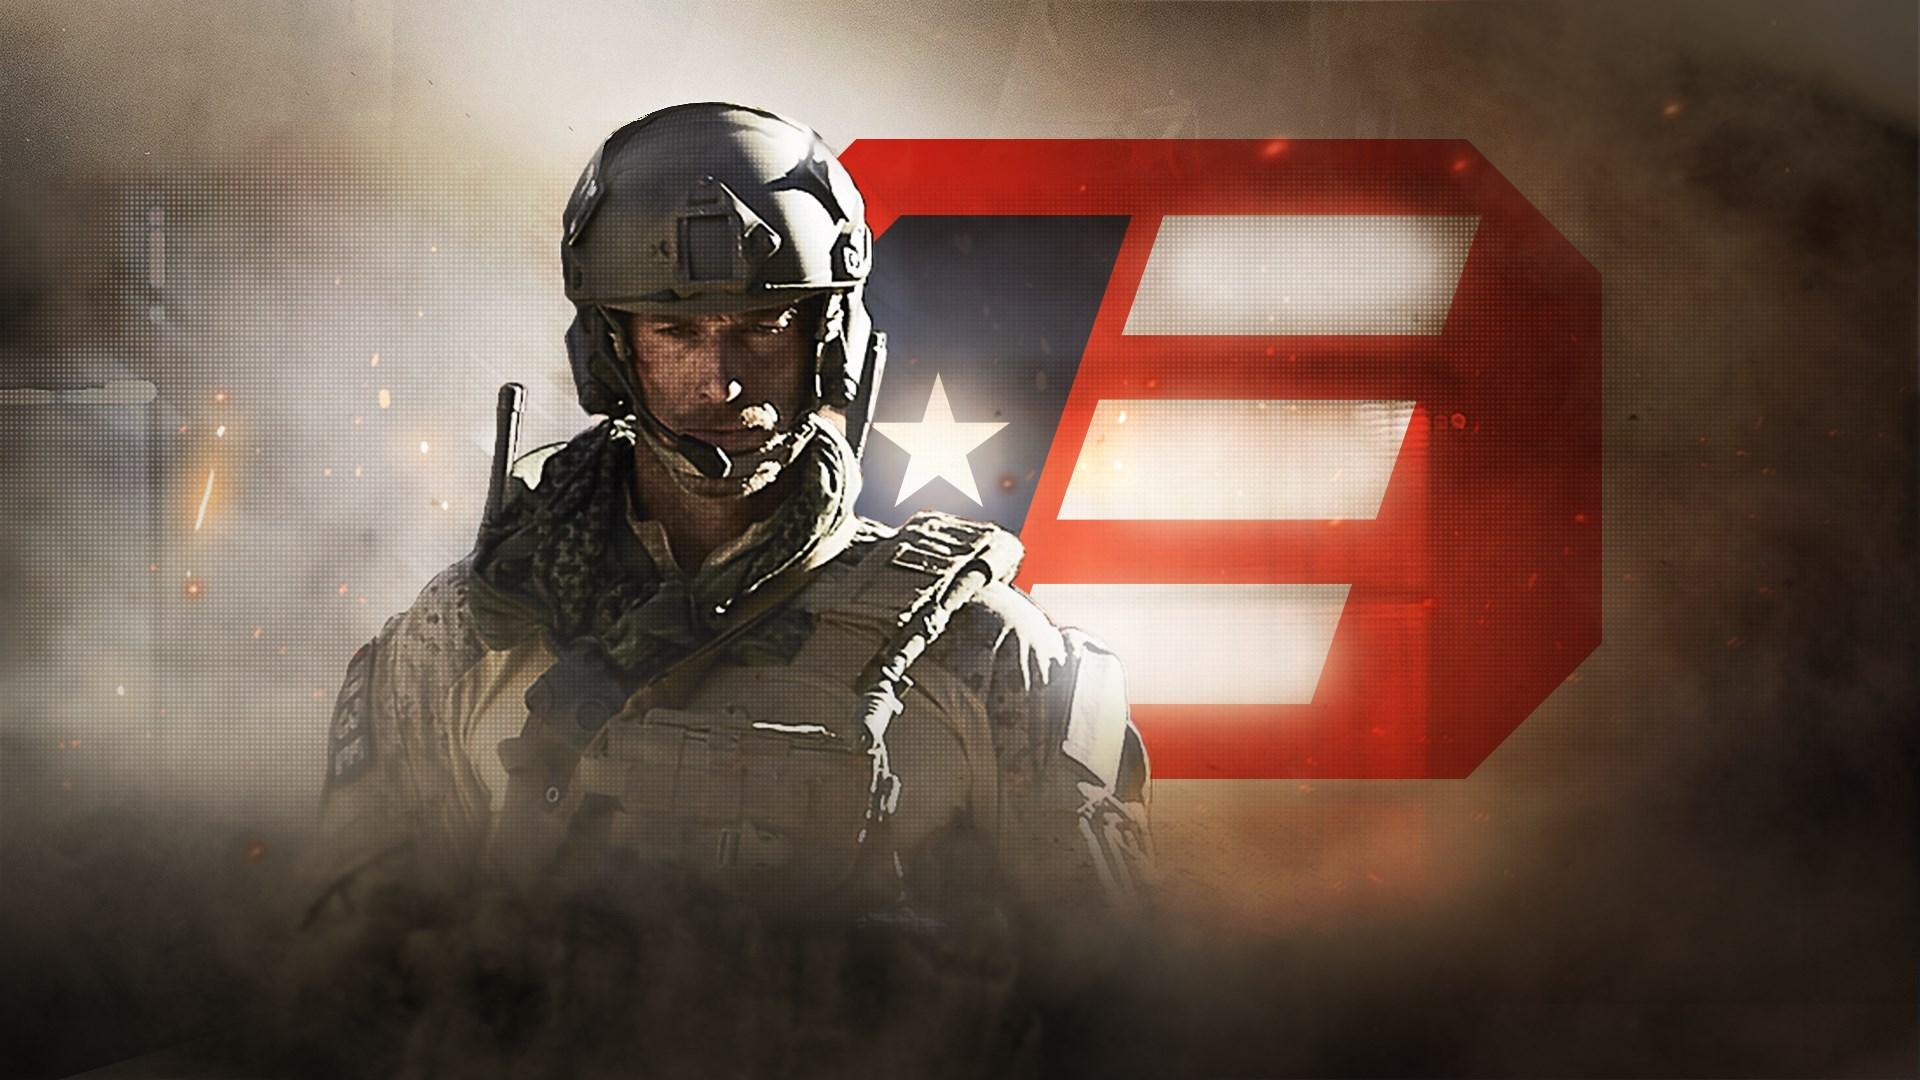 Call of Duty®: Modern Warfare® - C.O.D.E. Fearless Pack